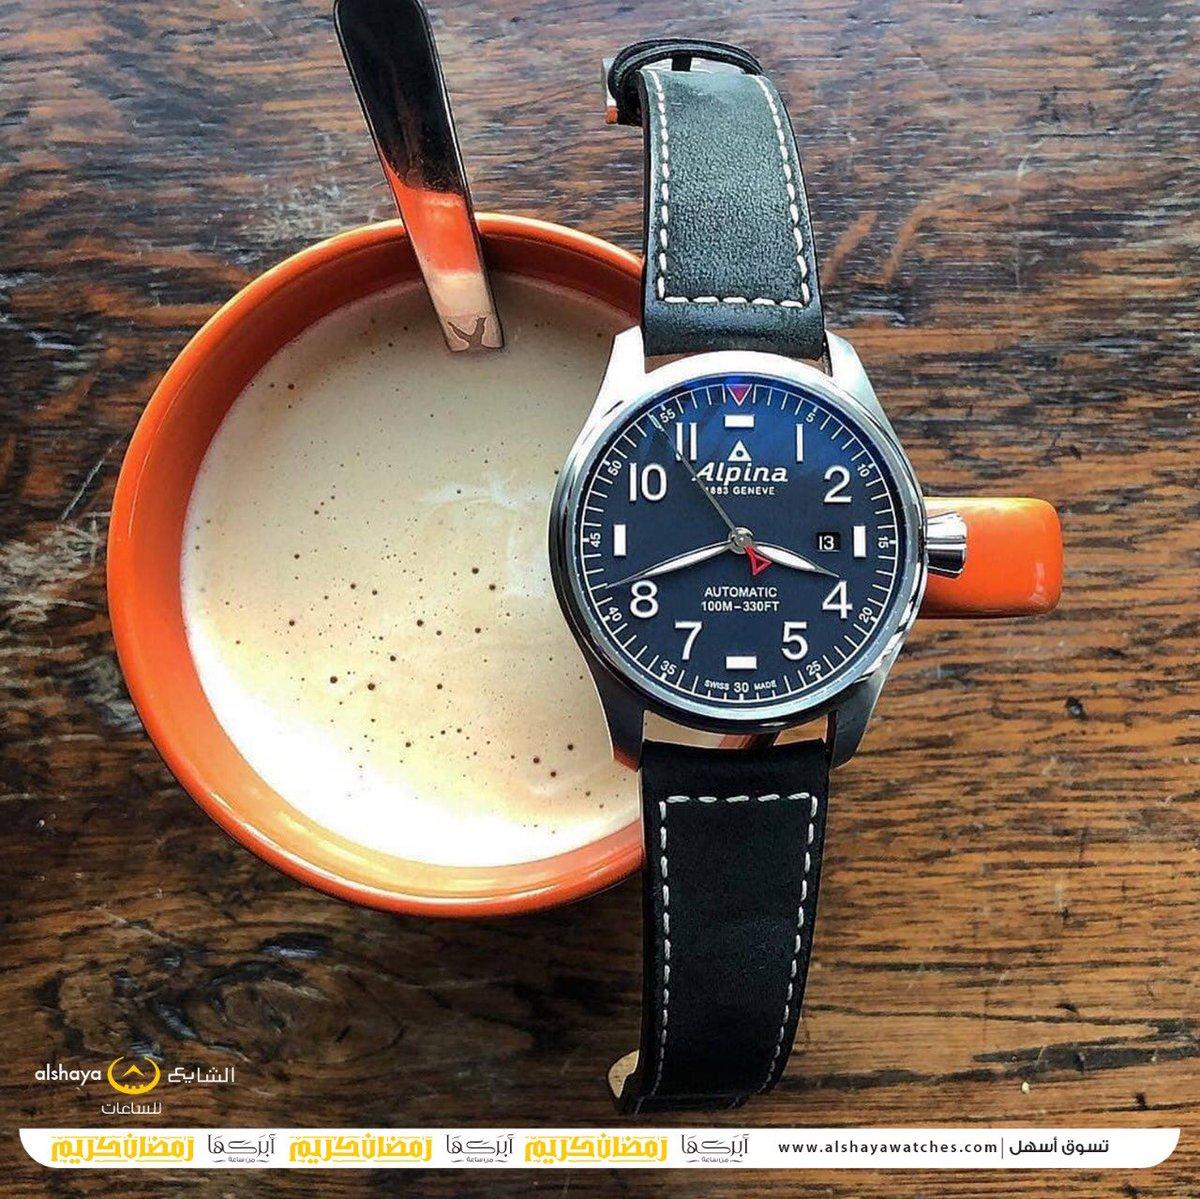 fc9198f0d75d1 ... بميناء أزرق داكن ونظام عمل  أتوماتيكي ساعة ذات روح كلاسيكية خاصة بها  تزيدك تميزًا و أناقة . متوفرة لدى معارض   الشايع للساعاتpic.twitter.com 5E6aPrGpnu